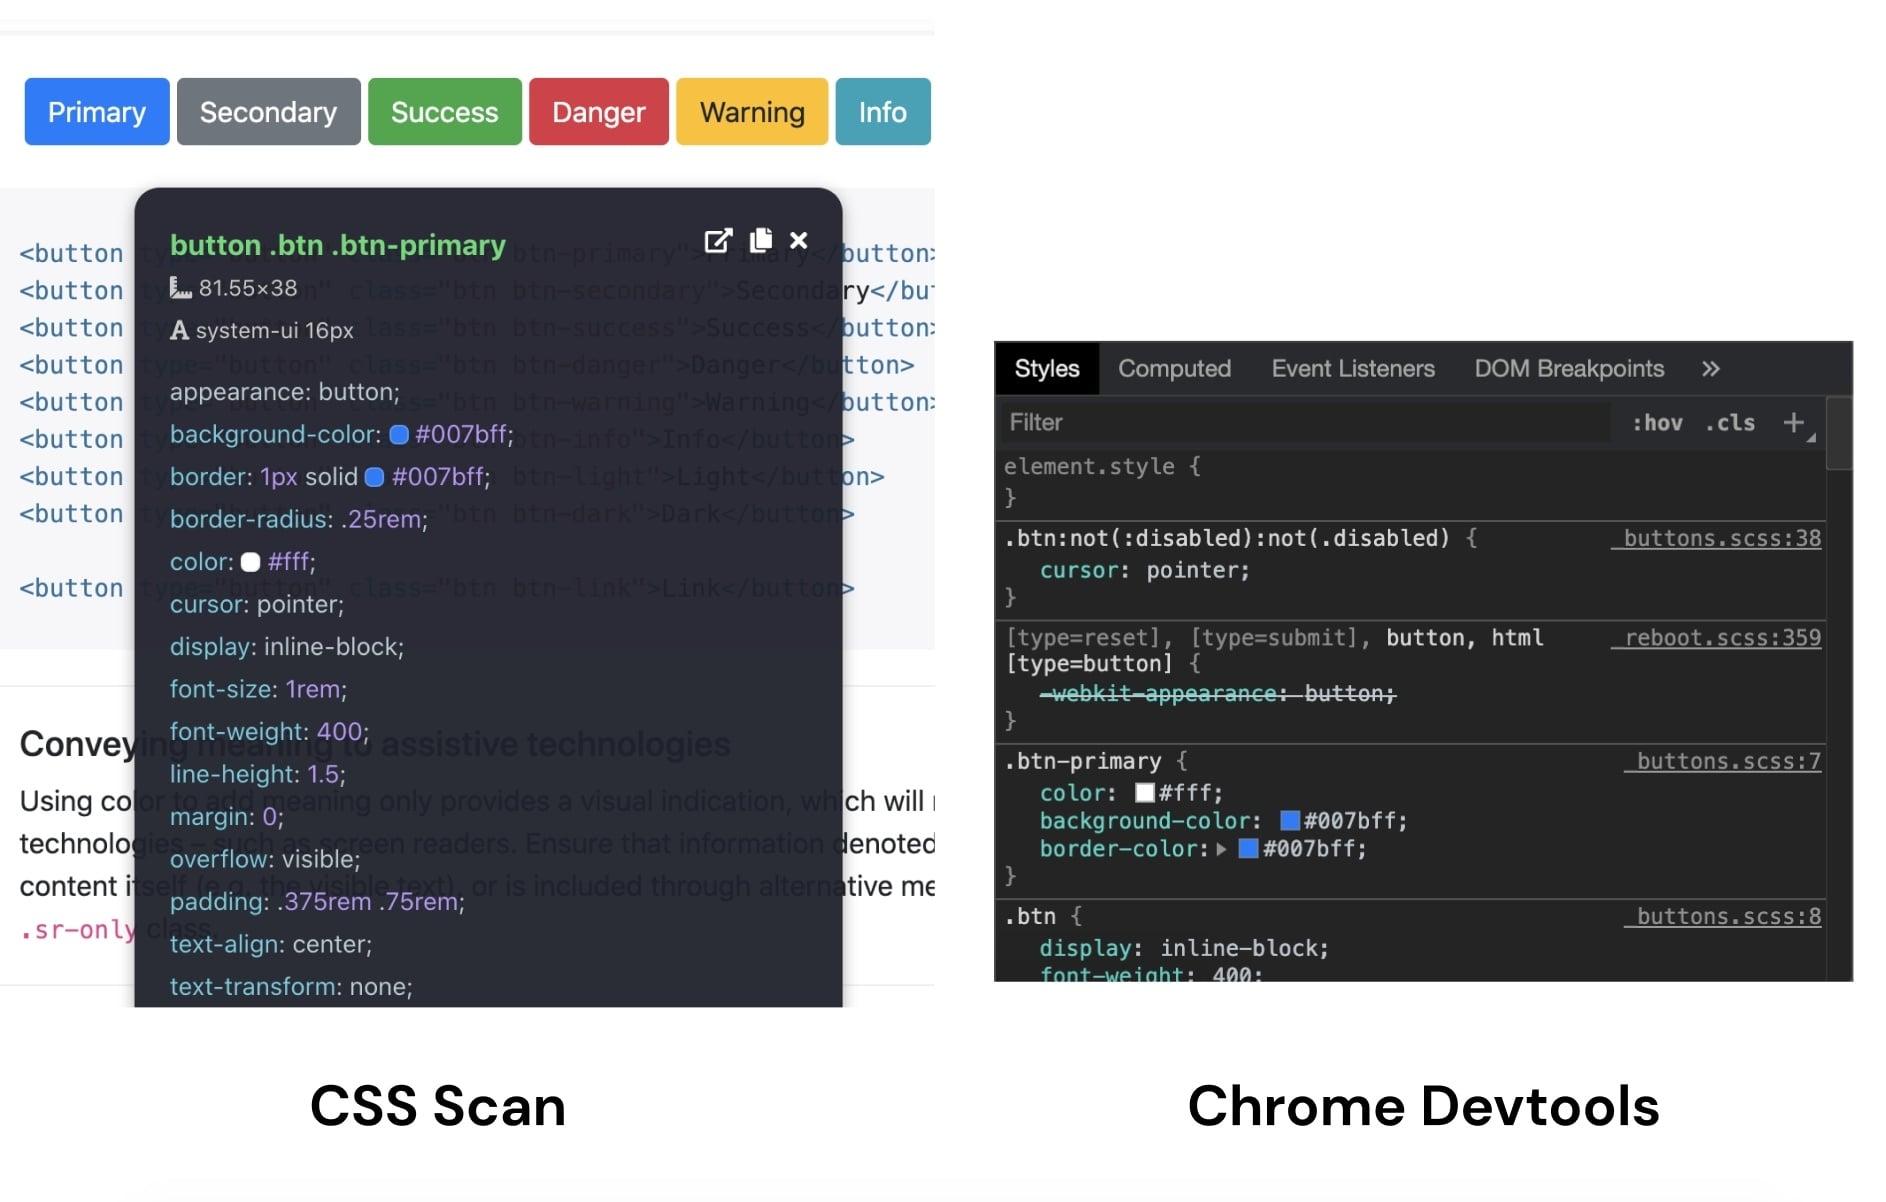 Side by side comparison - CSS Scan vs Chrome Devtools